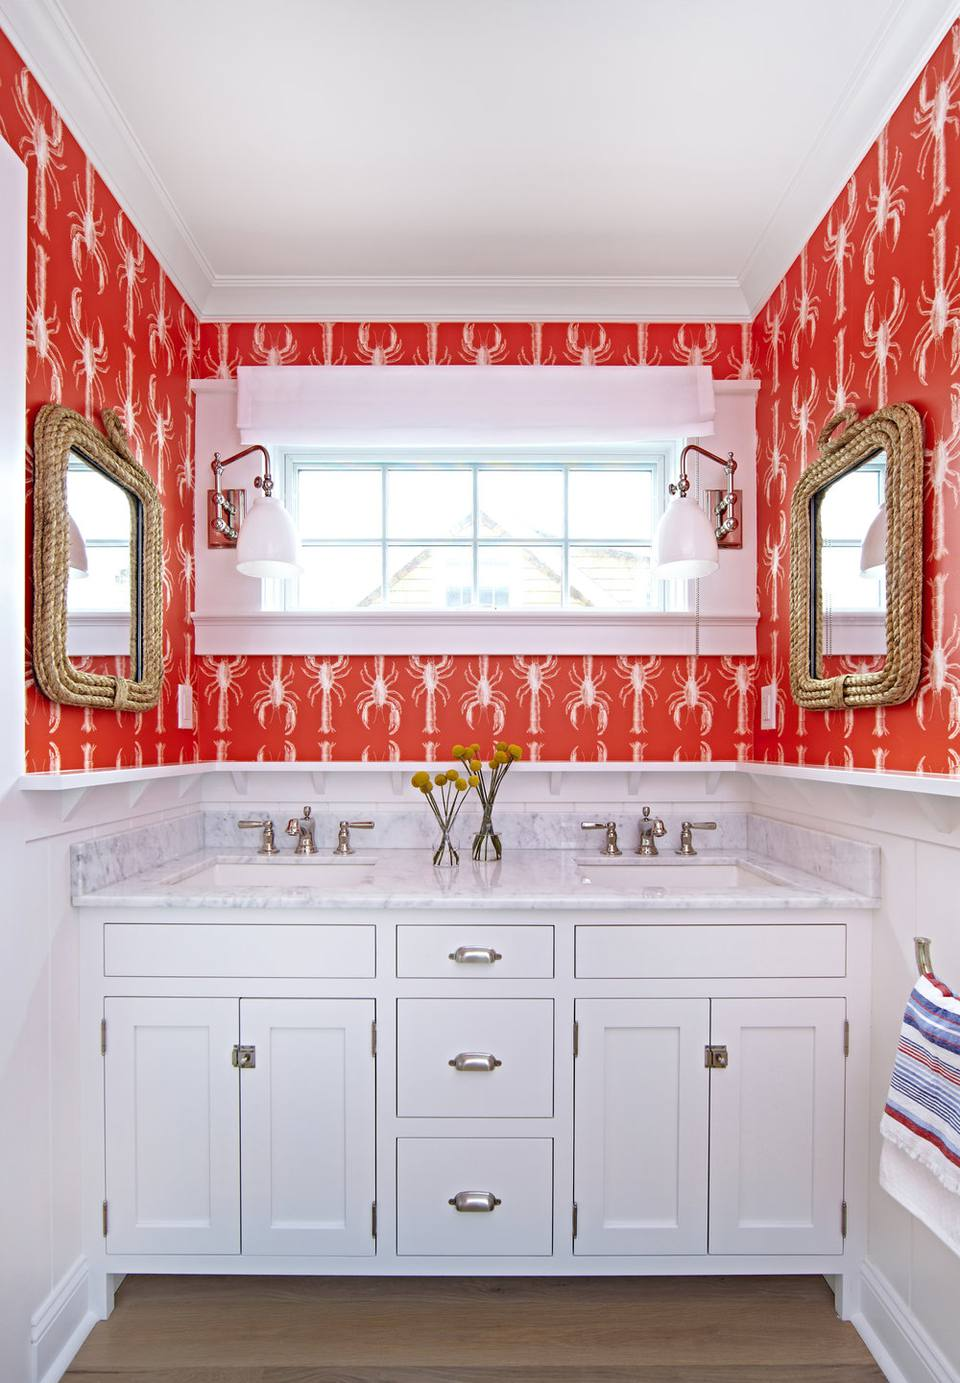 Lobster Patterned Wallpaper